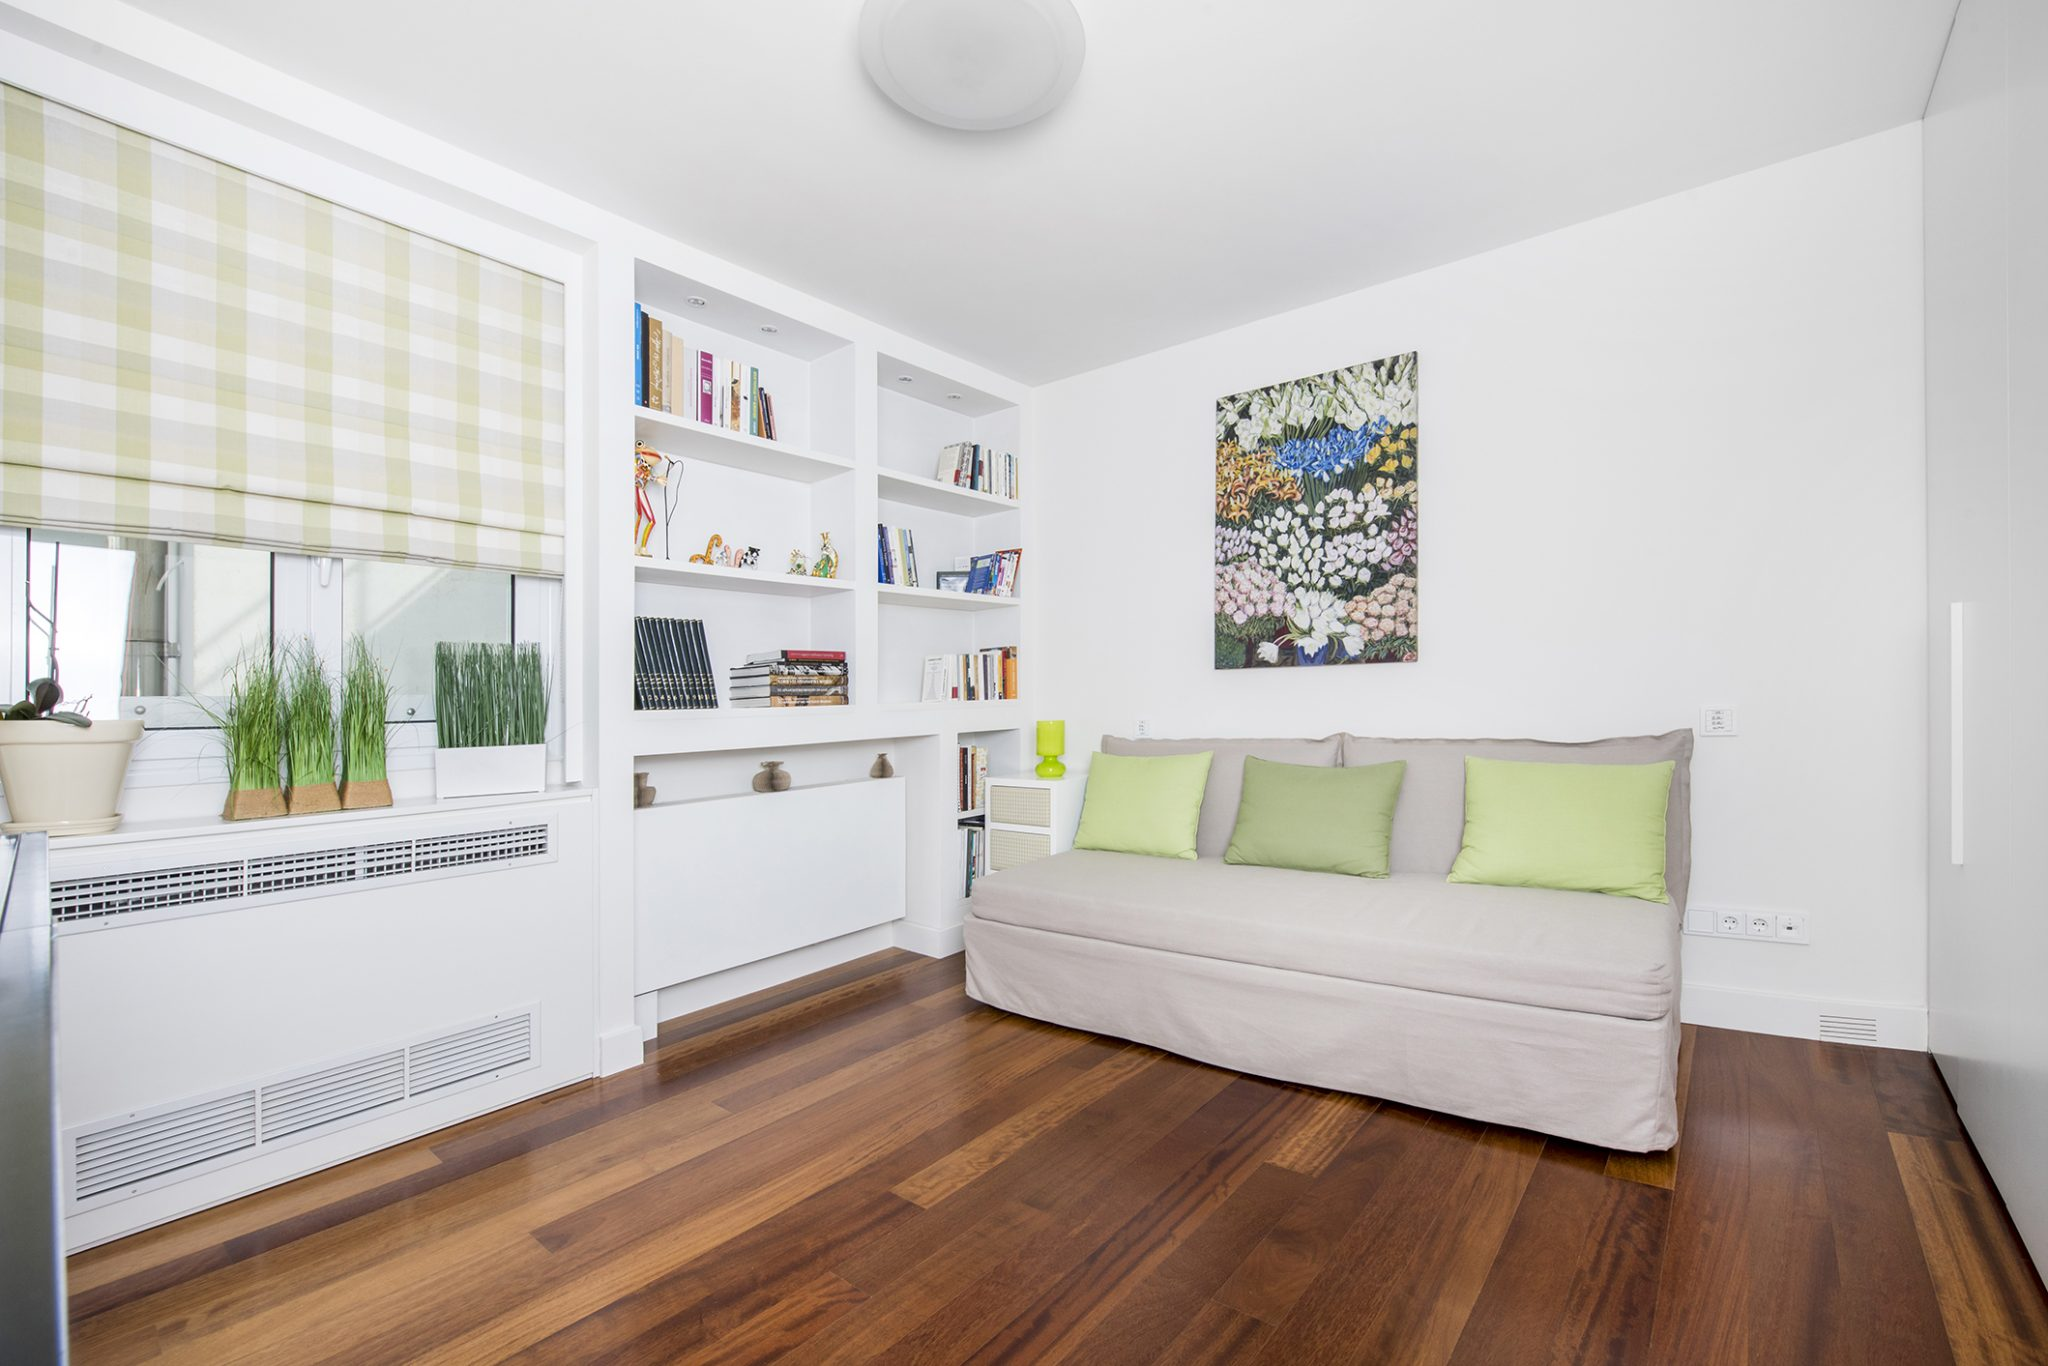 Kolonaki  - Appartement  - picture 11